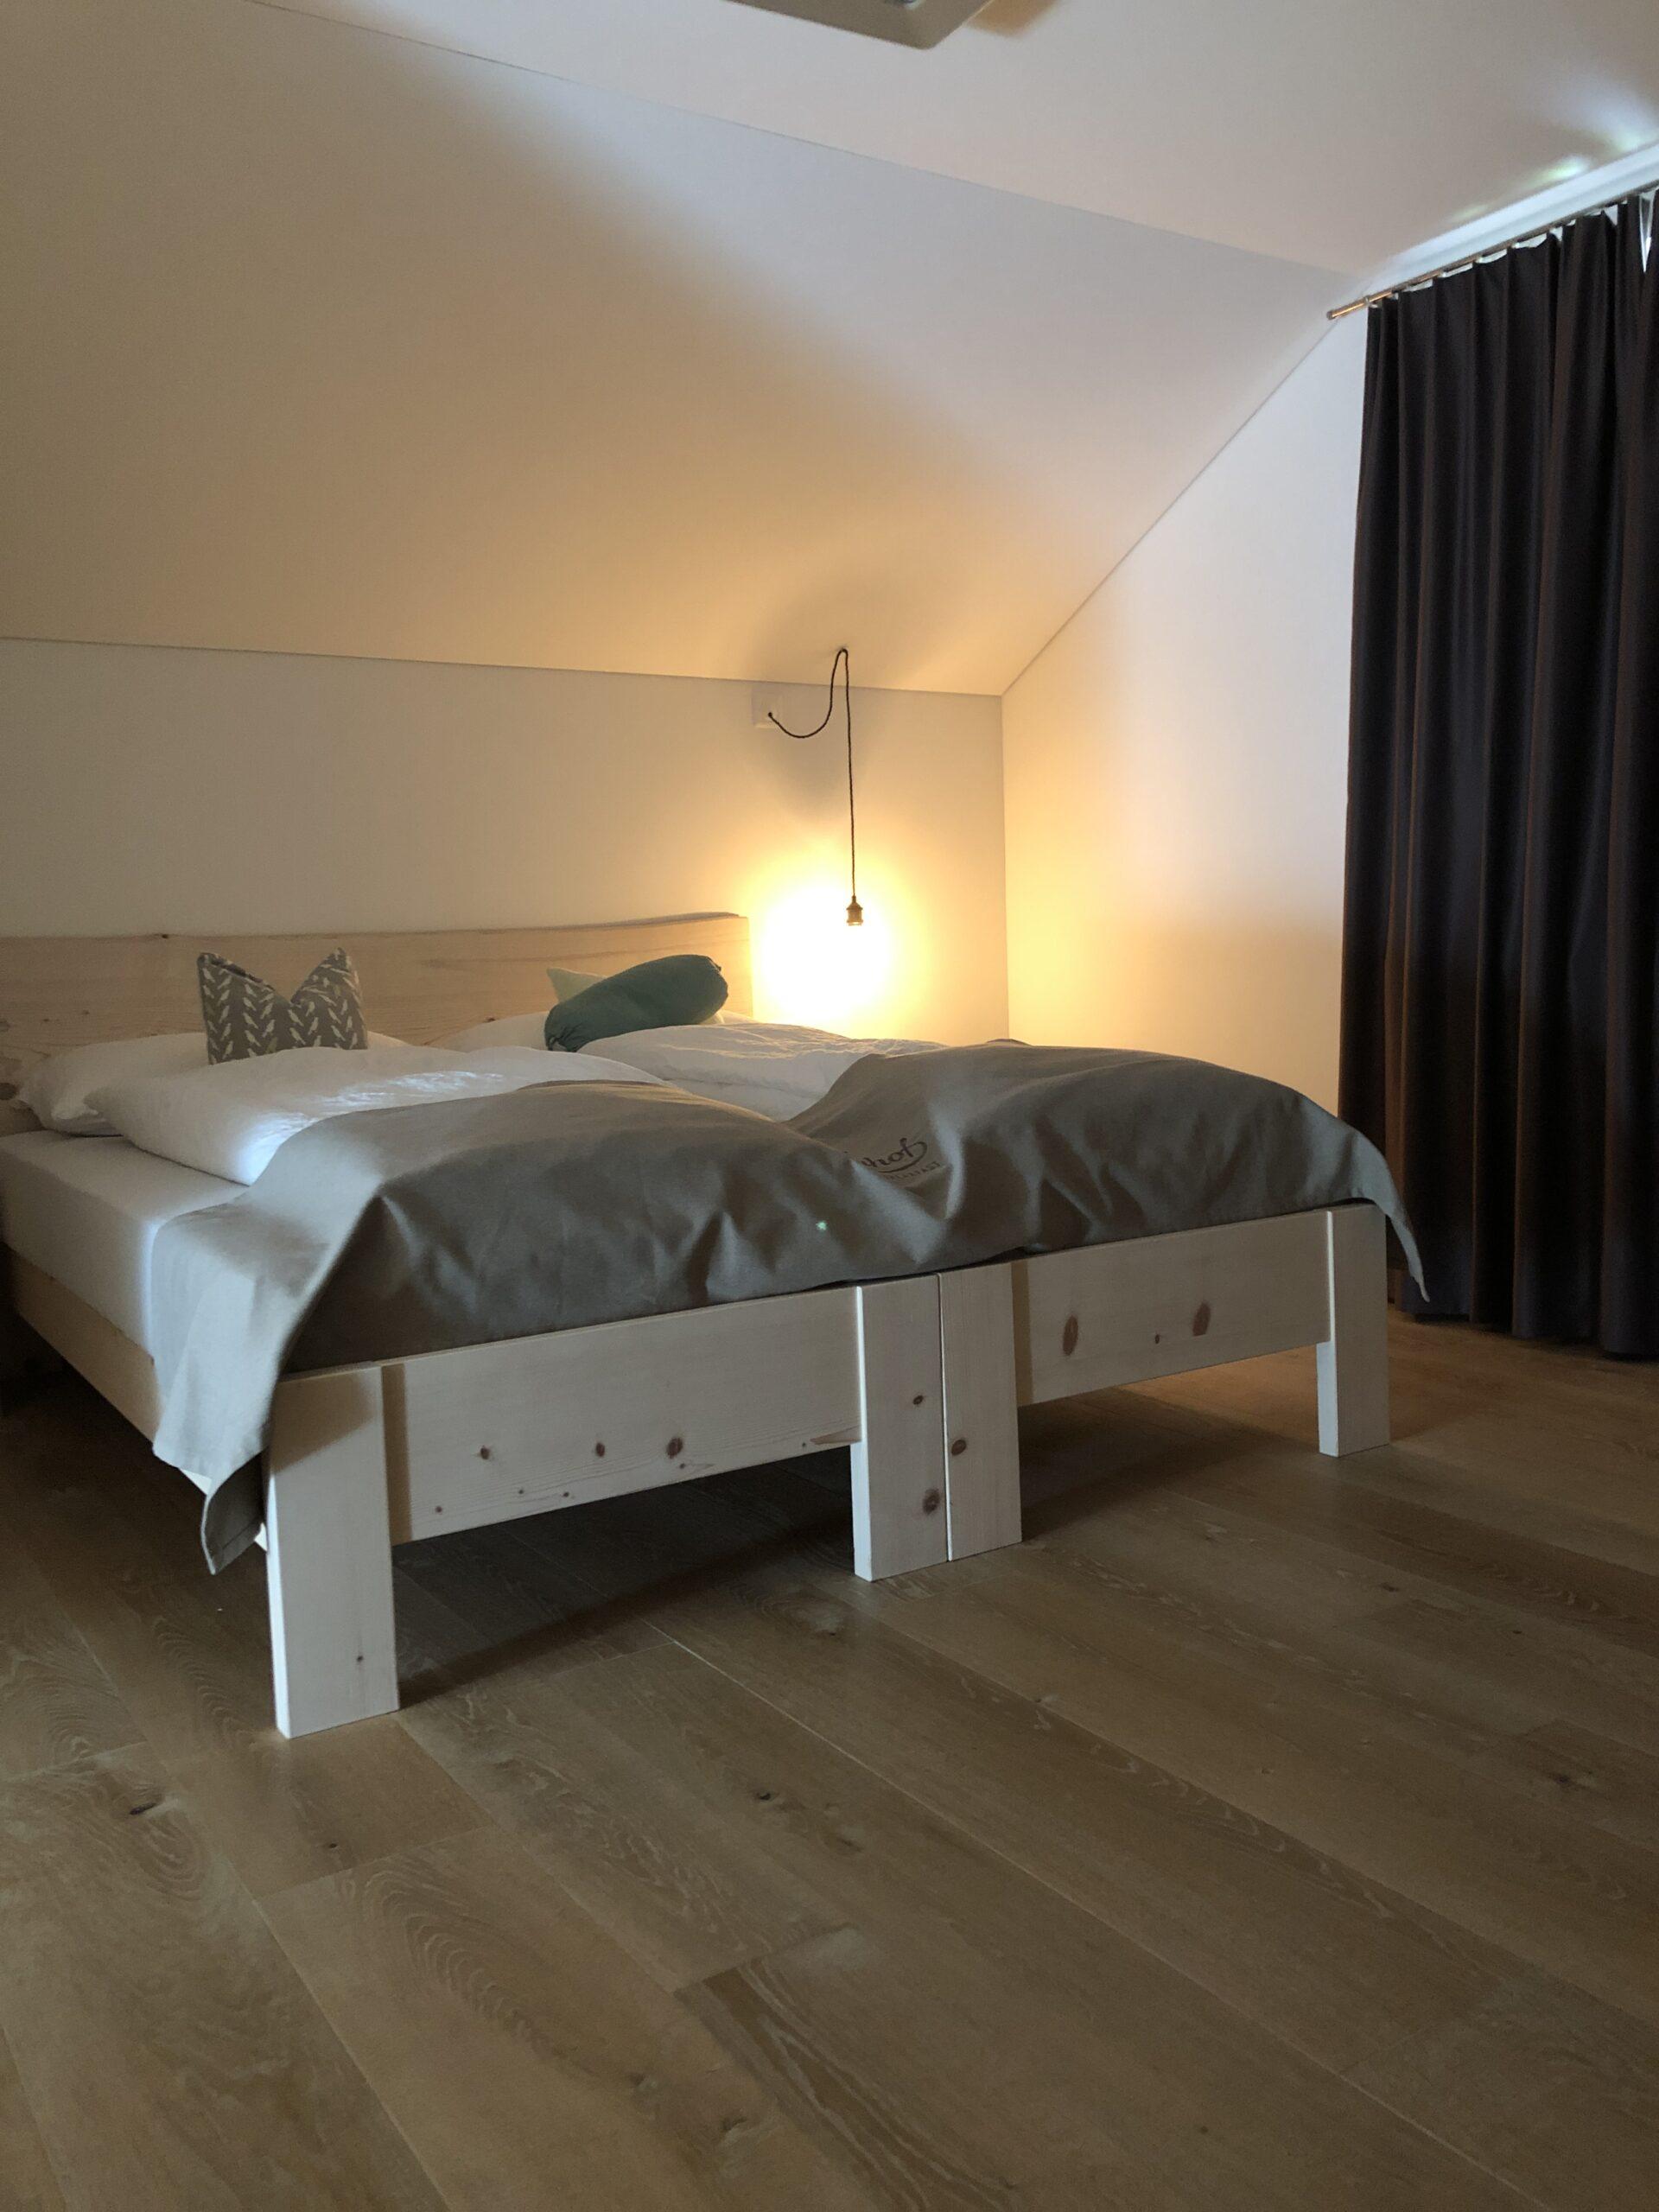 B&B Neuhof in Appenzell